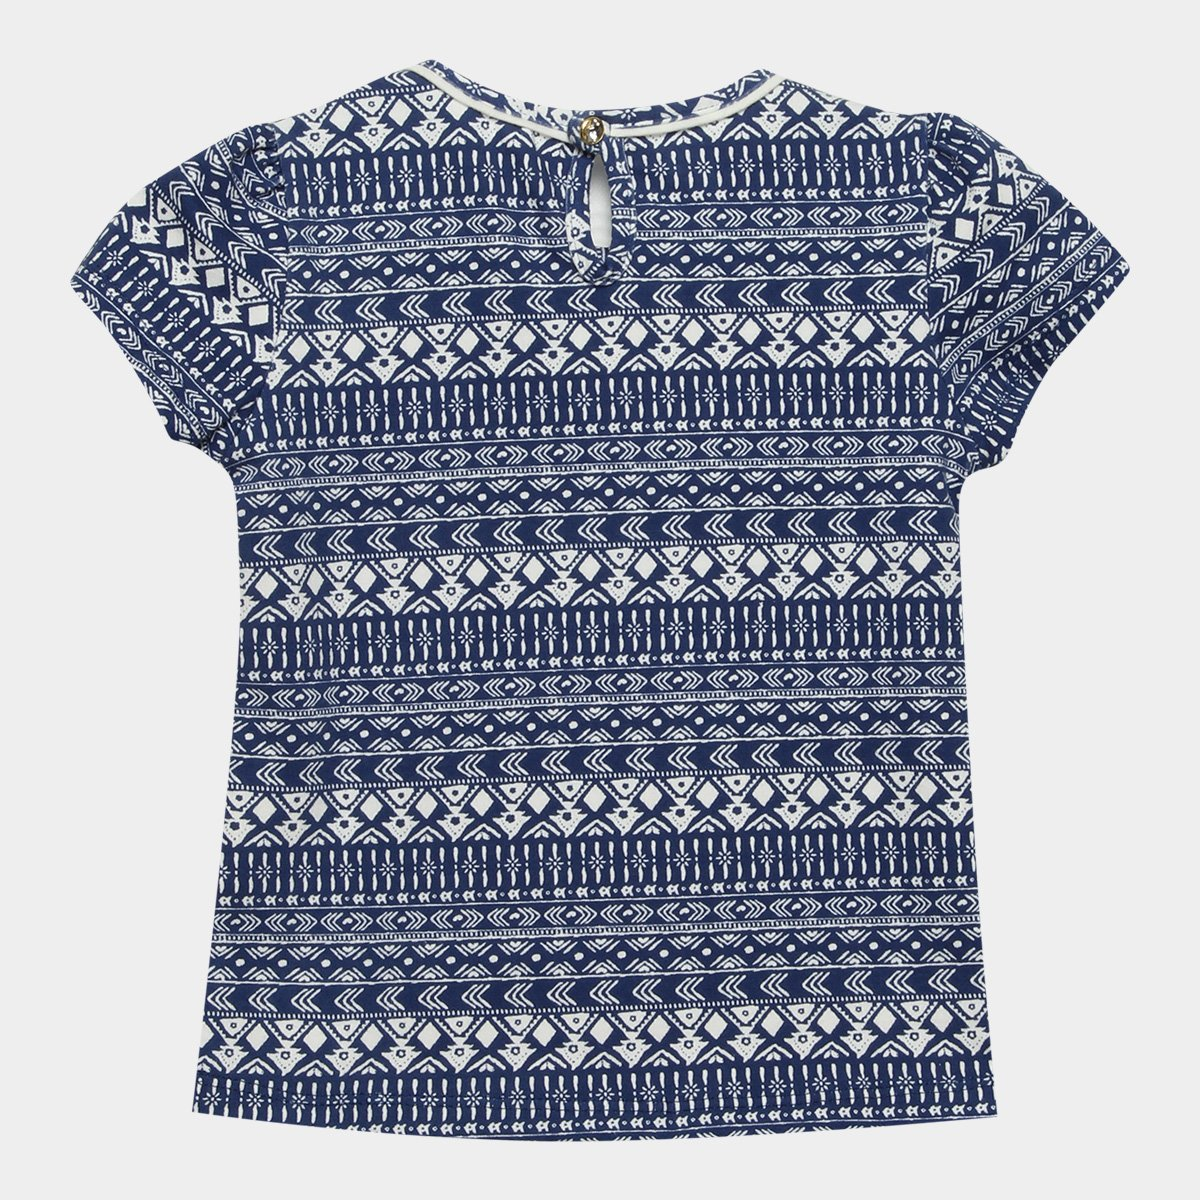 Ripilica Blusa Blusa Estampada Lilica e Feminina Infantil Infantil Branco Marinho Lilica nq7XxHqT